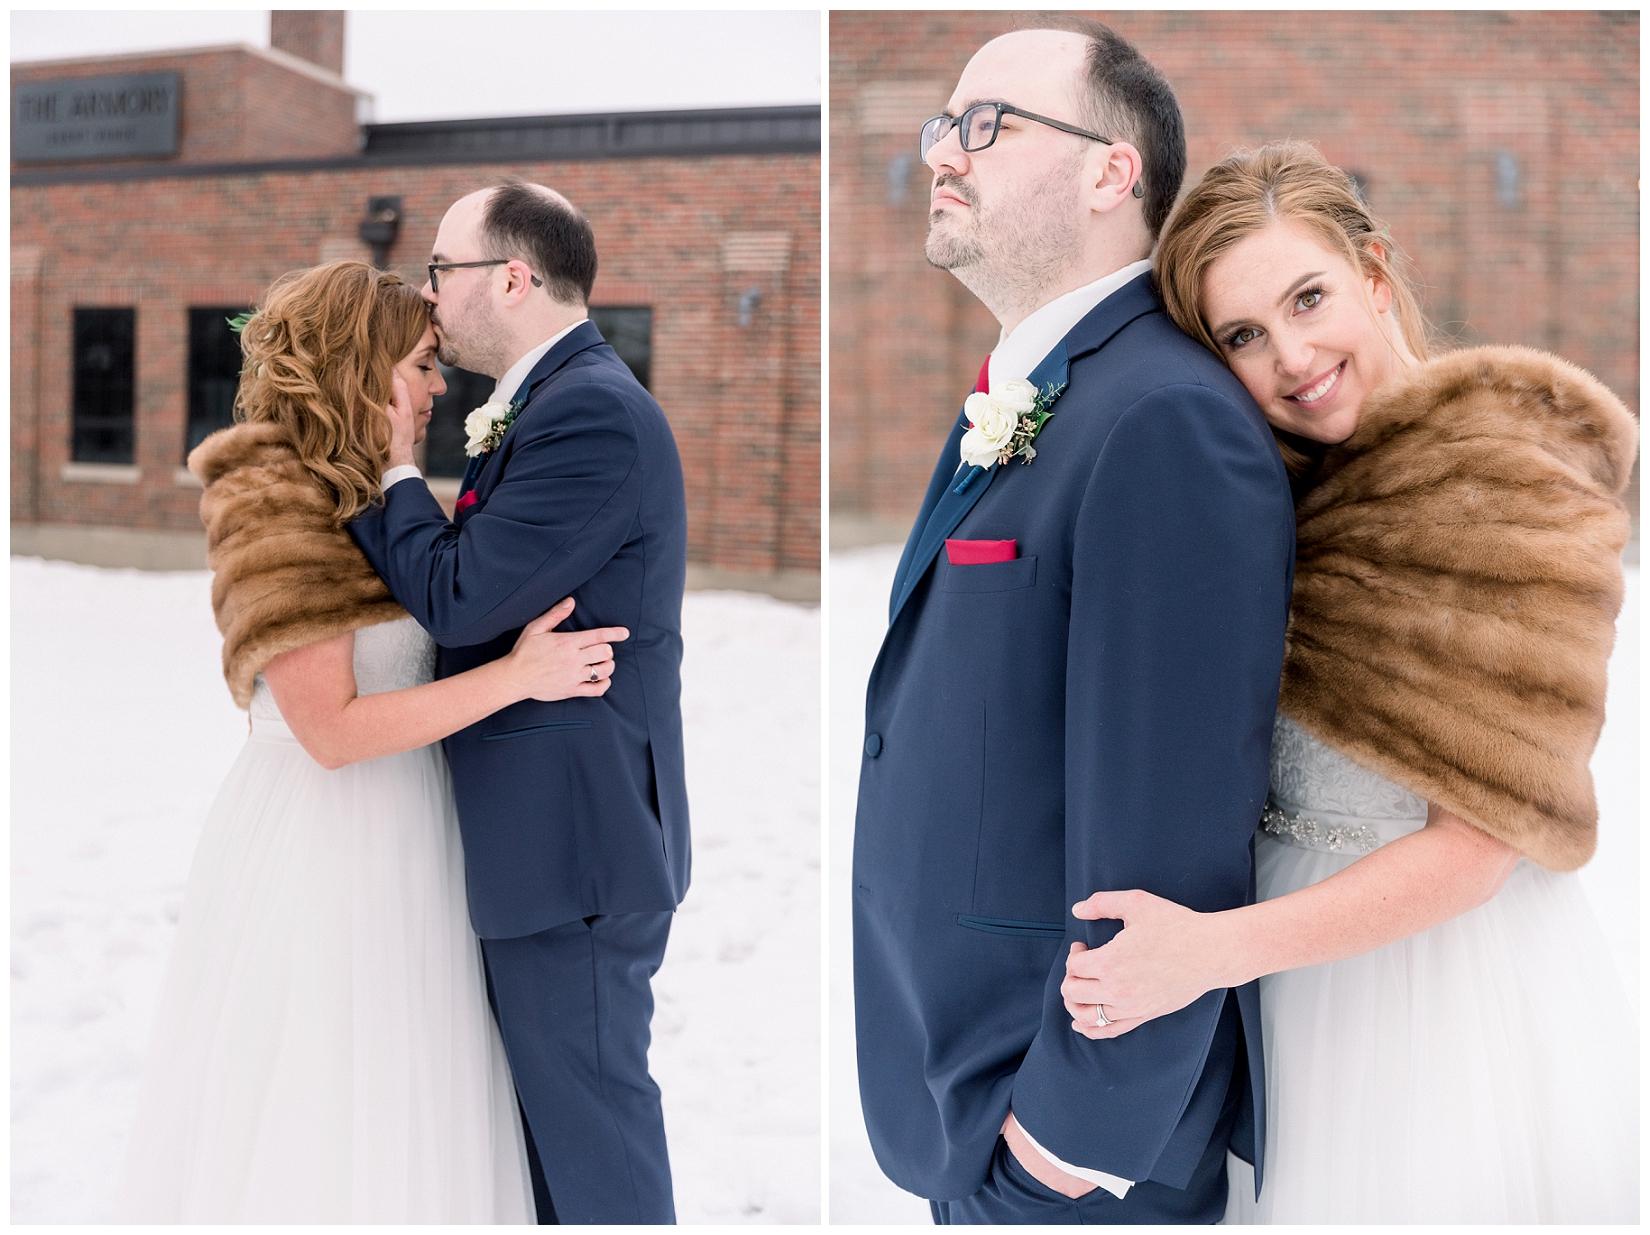 cat-alkire-wedding-photographer-indiana-chicago-indianapolis-fort-wayne_0977.jpg